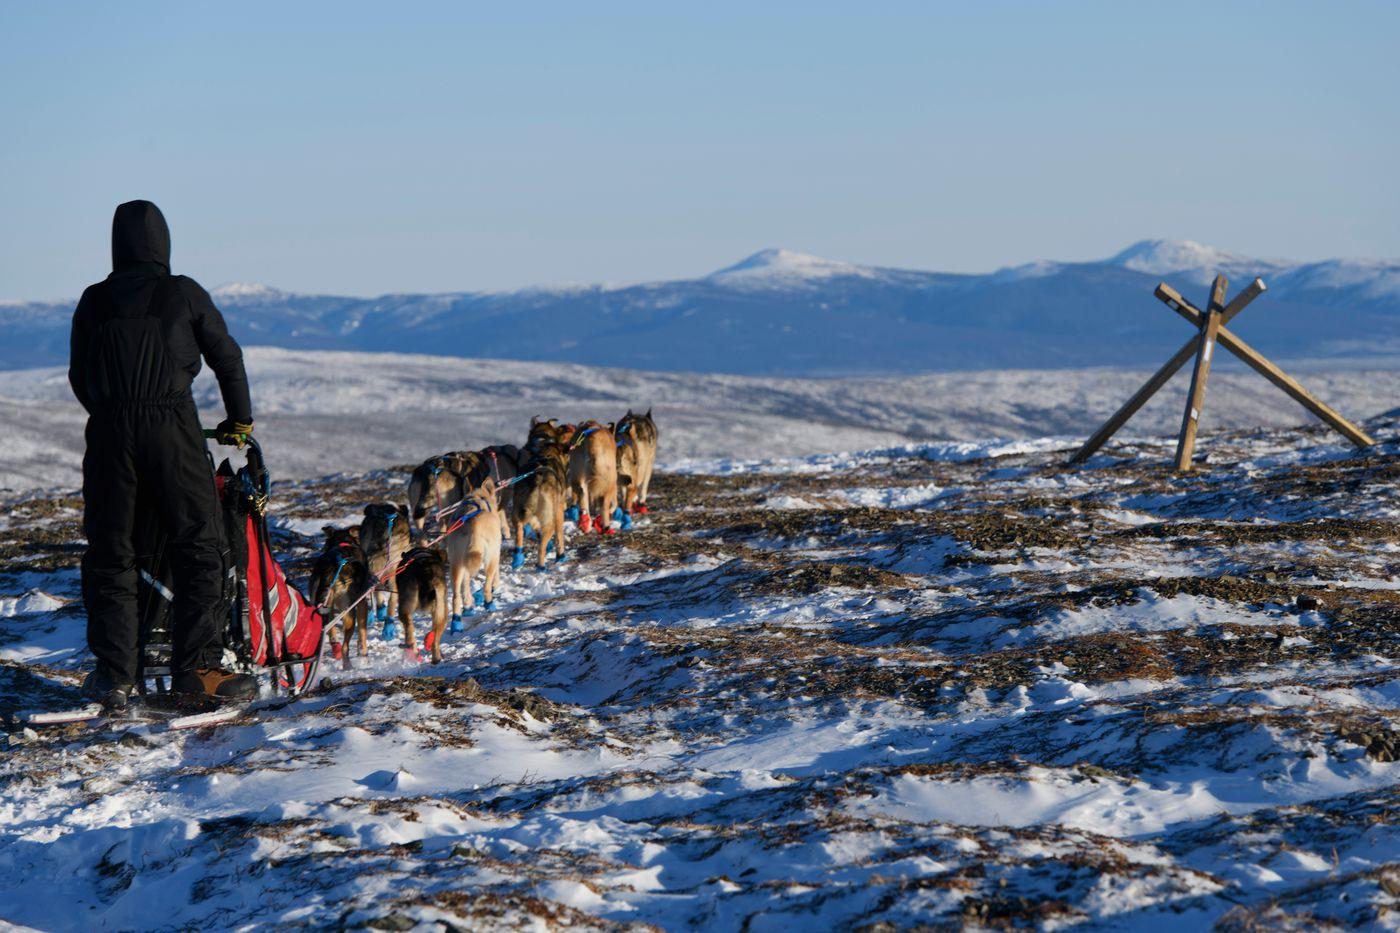 Deke Naaktgeboren, a race veteran from Fairbanks, reaches Eagle Summit during the Summit Quest 300 on February 14, 2021. (Marc Lester / ADN)